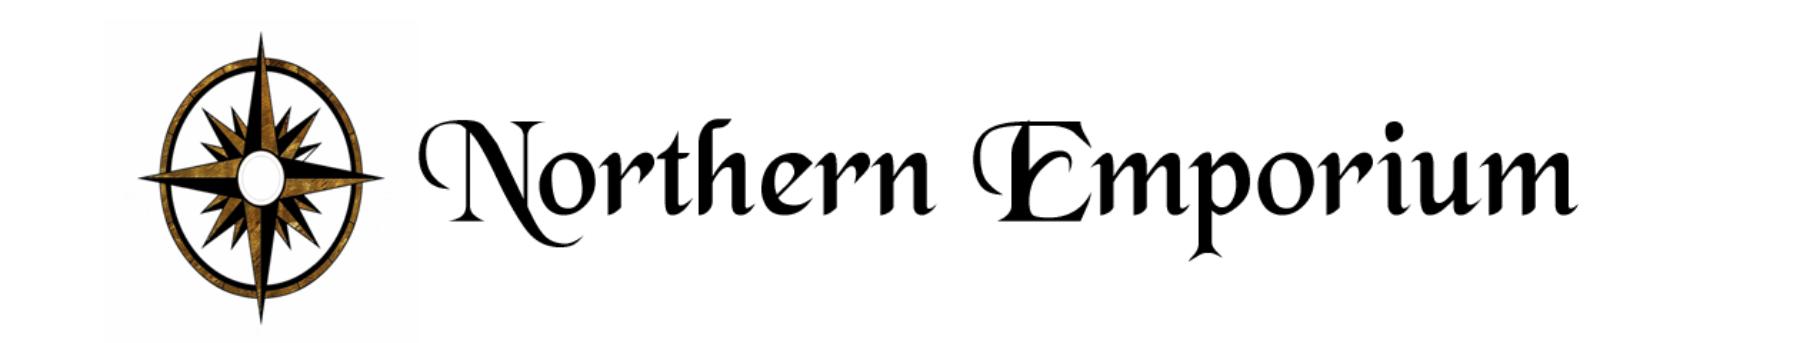 Northern Emporium